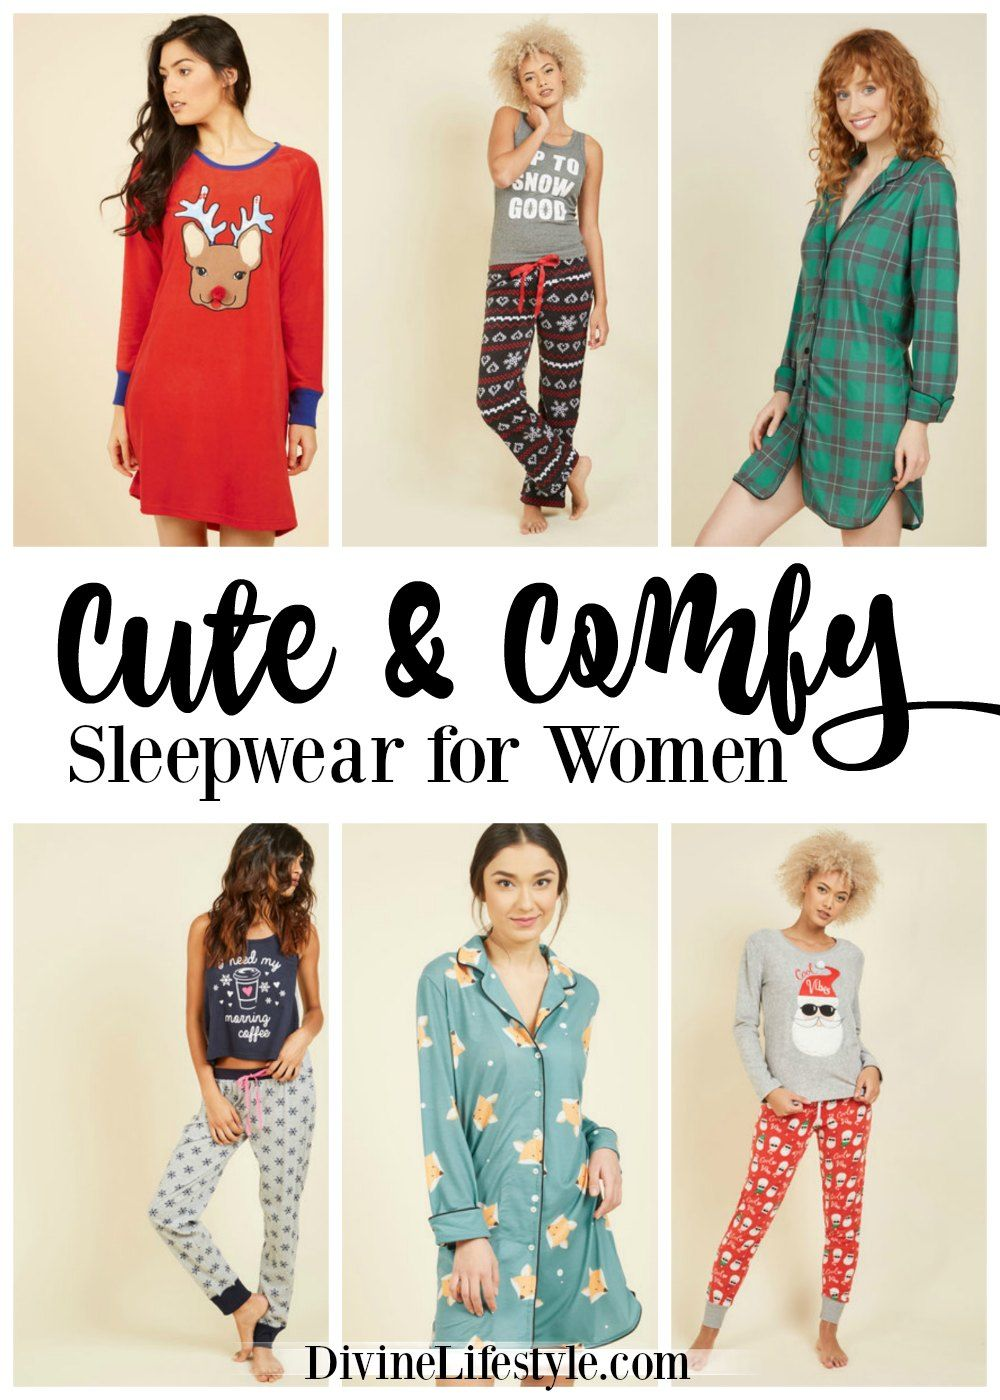 bamboo pajamas her texere soft set at comfortable for clothing sleep women pin s pajama sleepwear amazon comforter